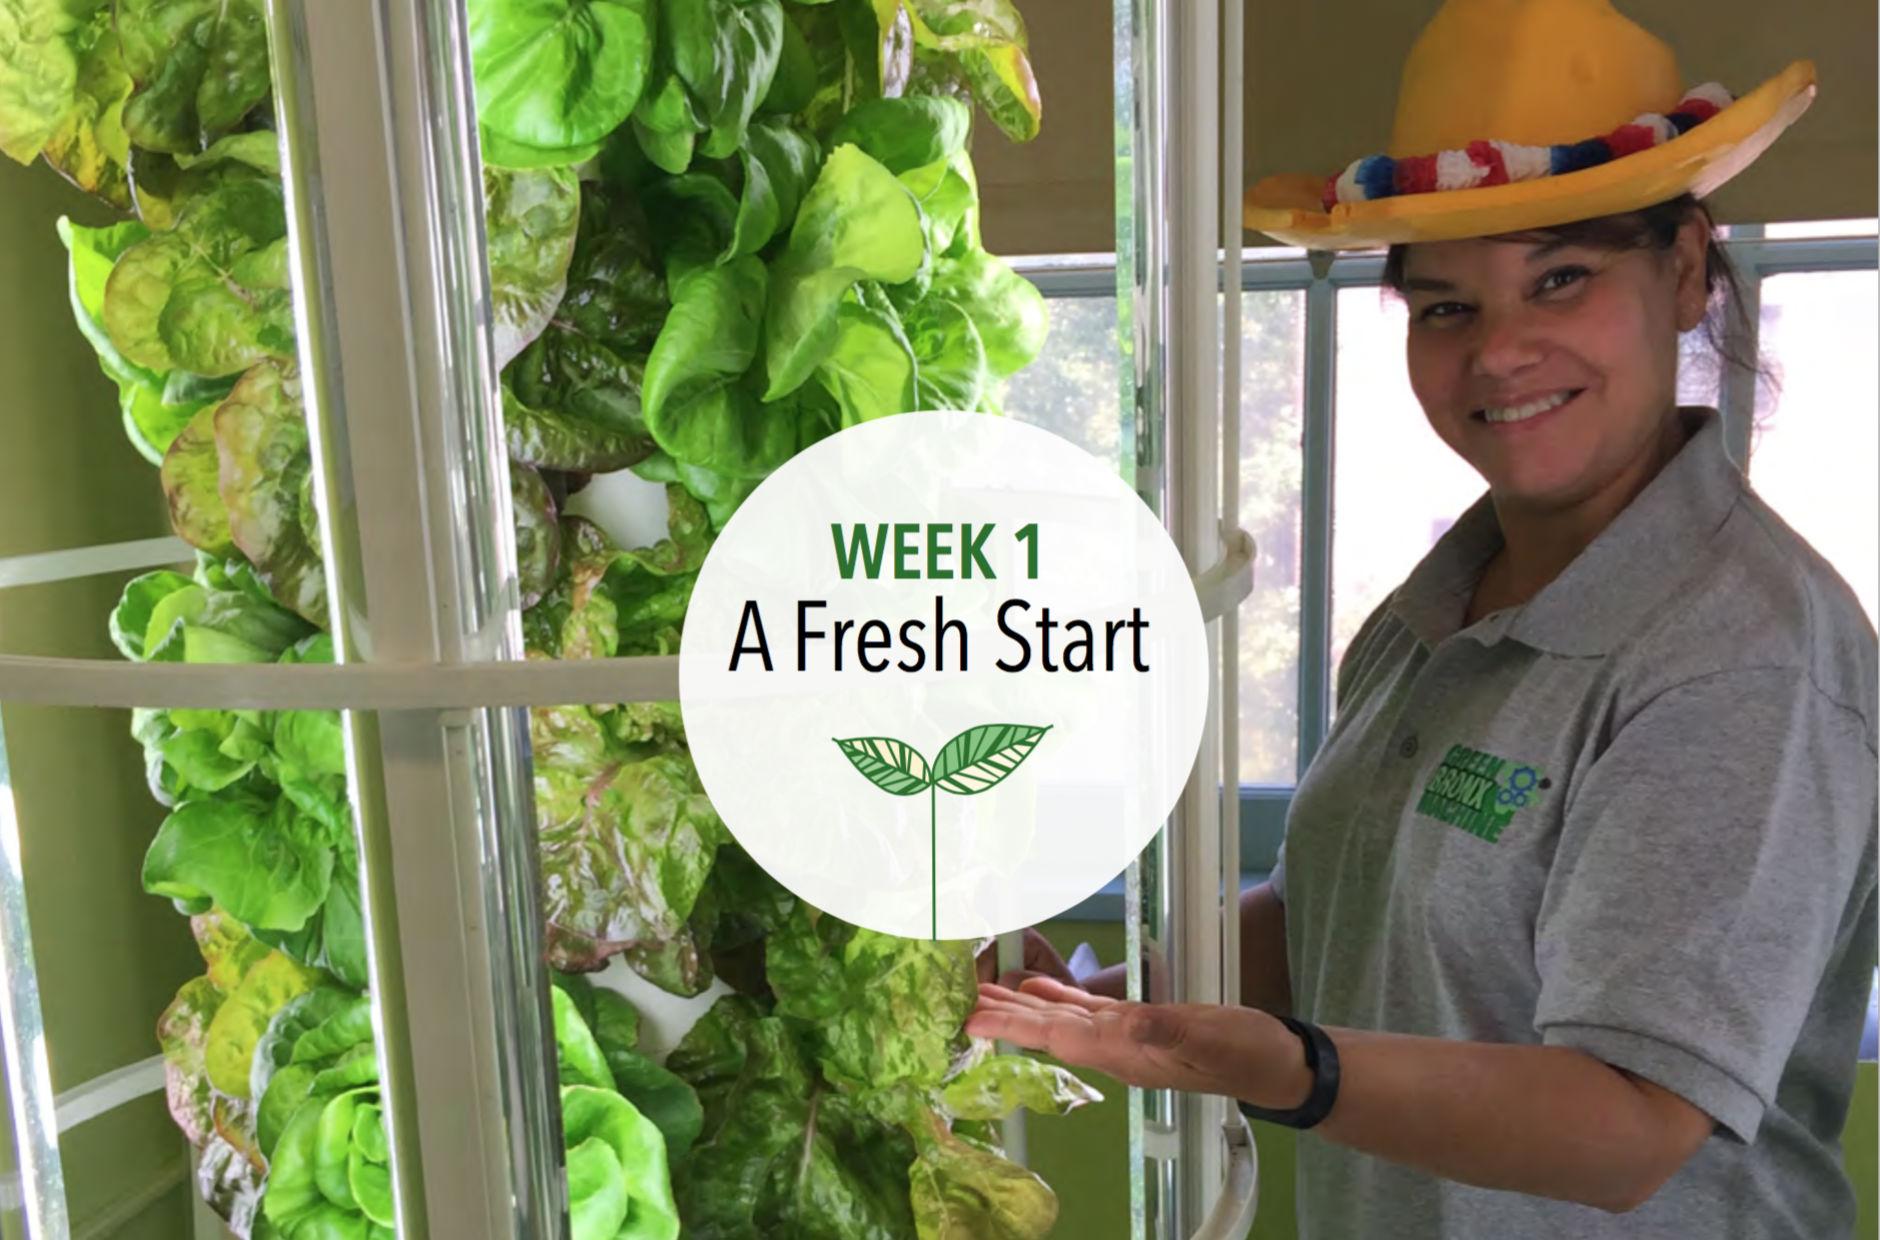 Week 1: A Fresh Start